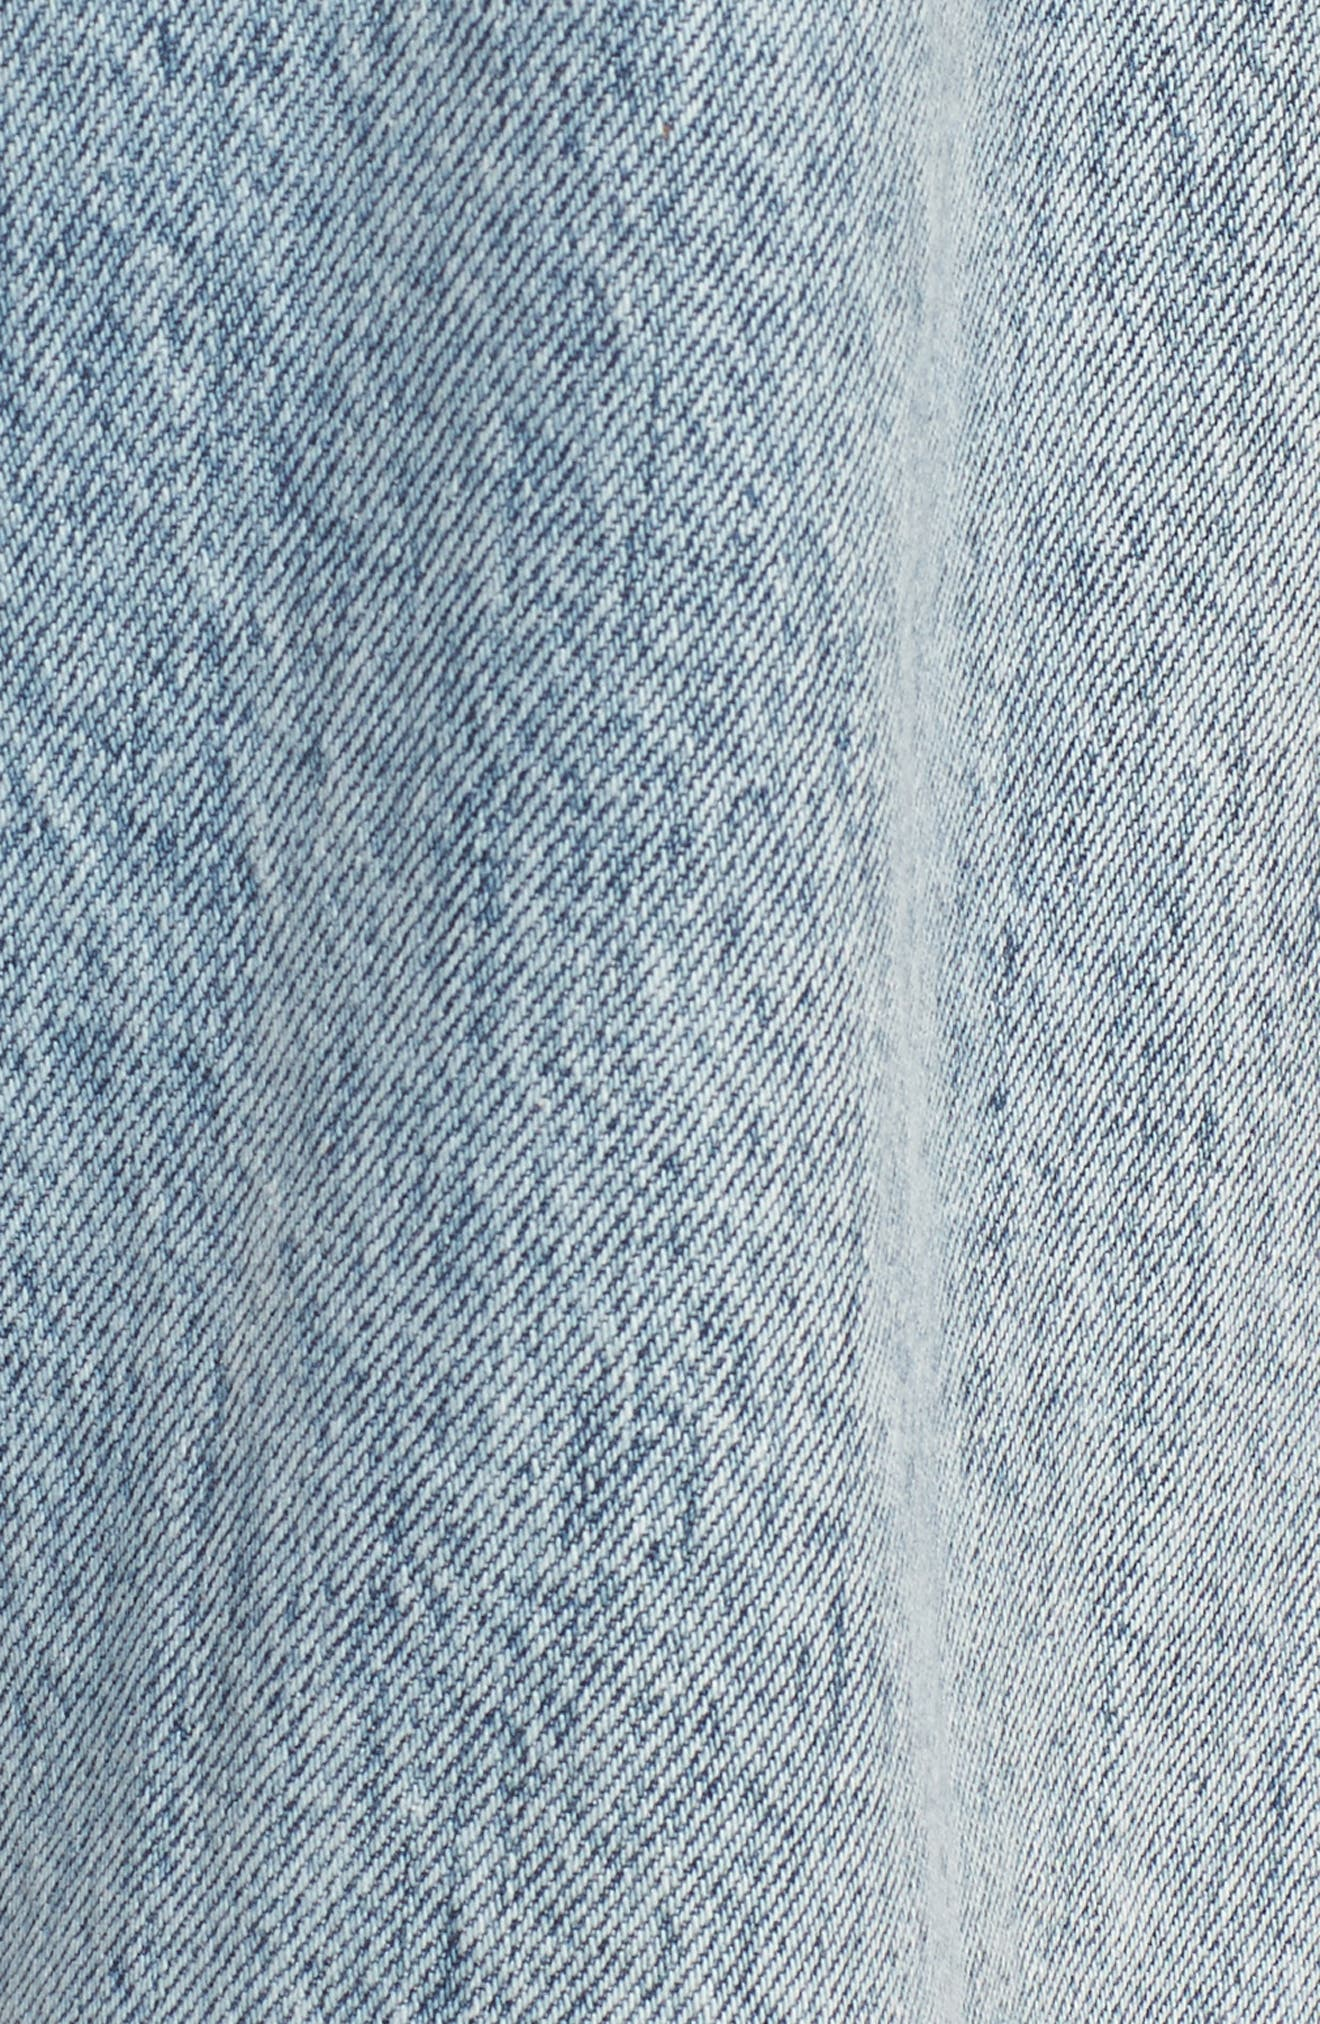 Alternate Image 6  - 7 For All Mankind® Rickie High Waist Boyfriend Jeans (Mineral Desert Springs)